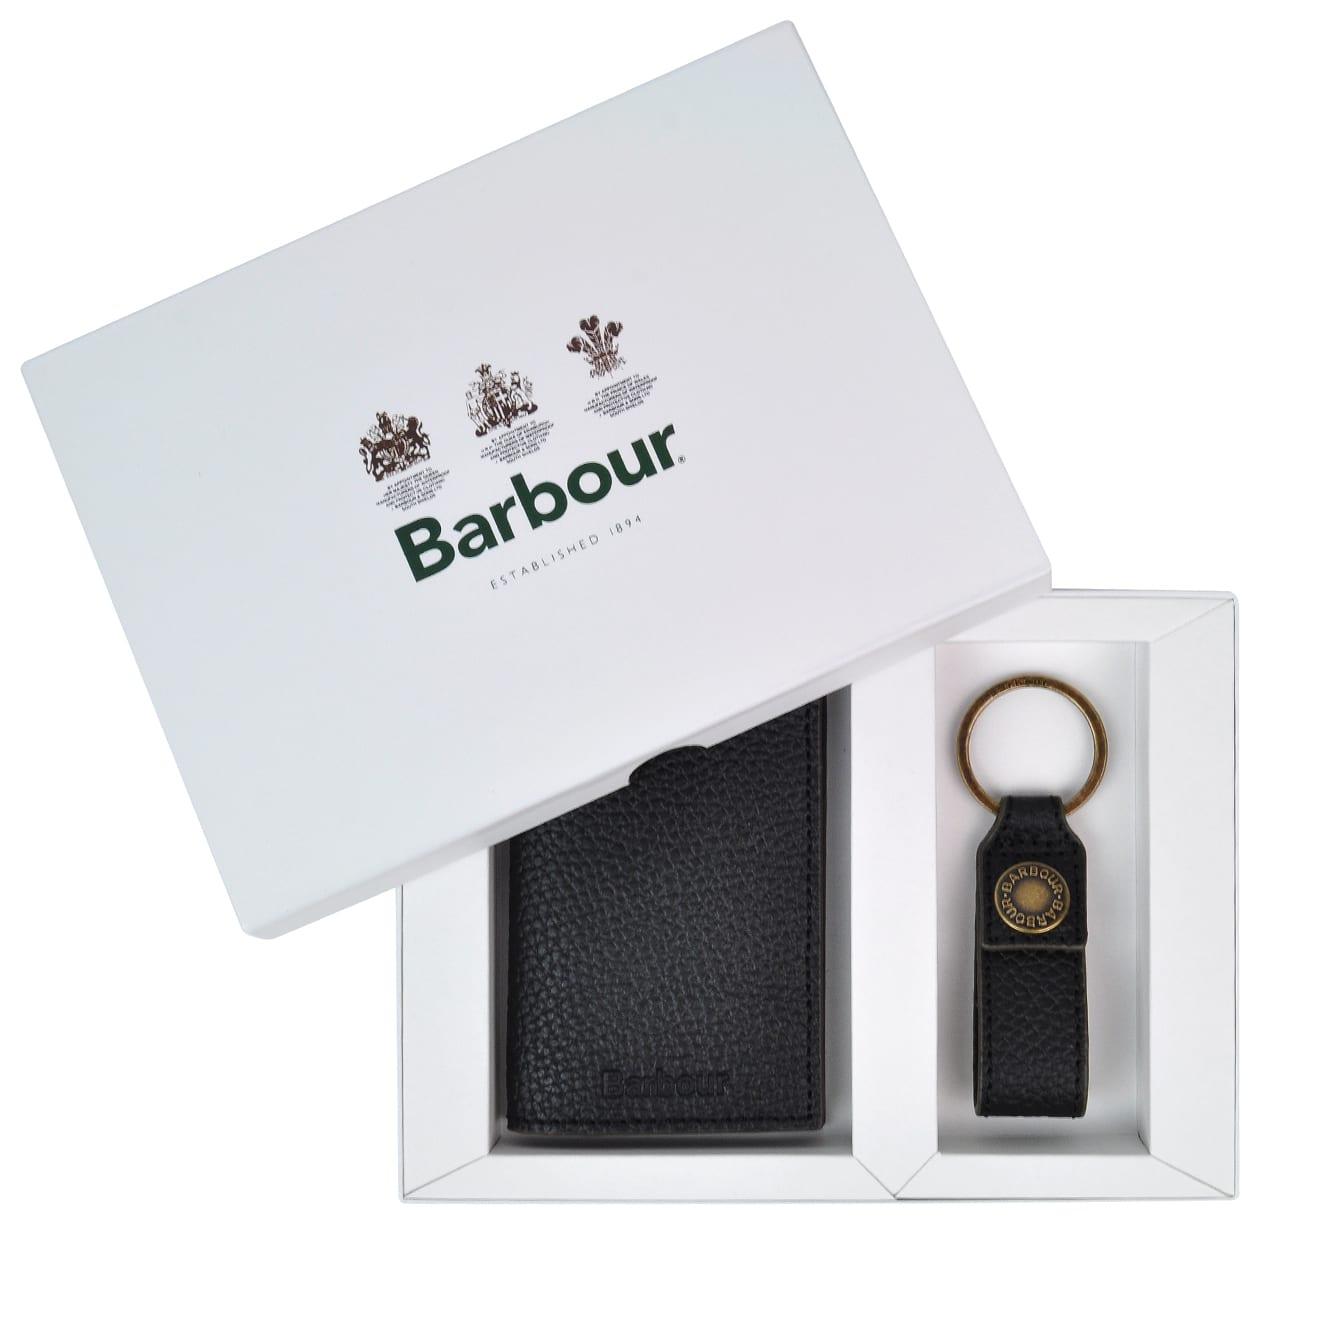 Barbour Grain leather wallet and keyring gift set black